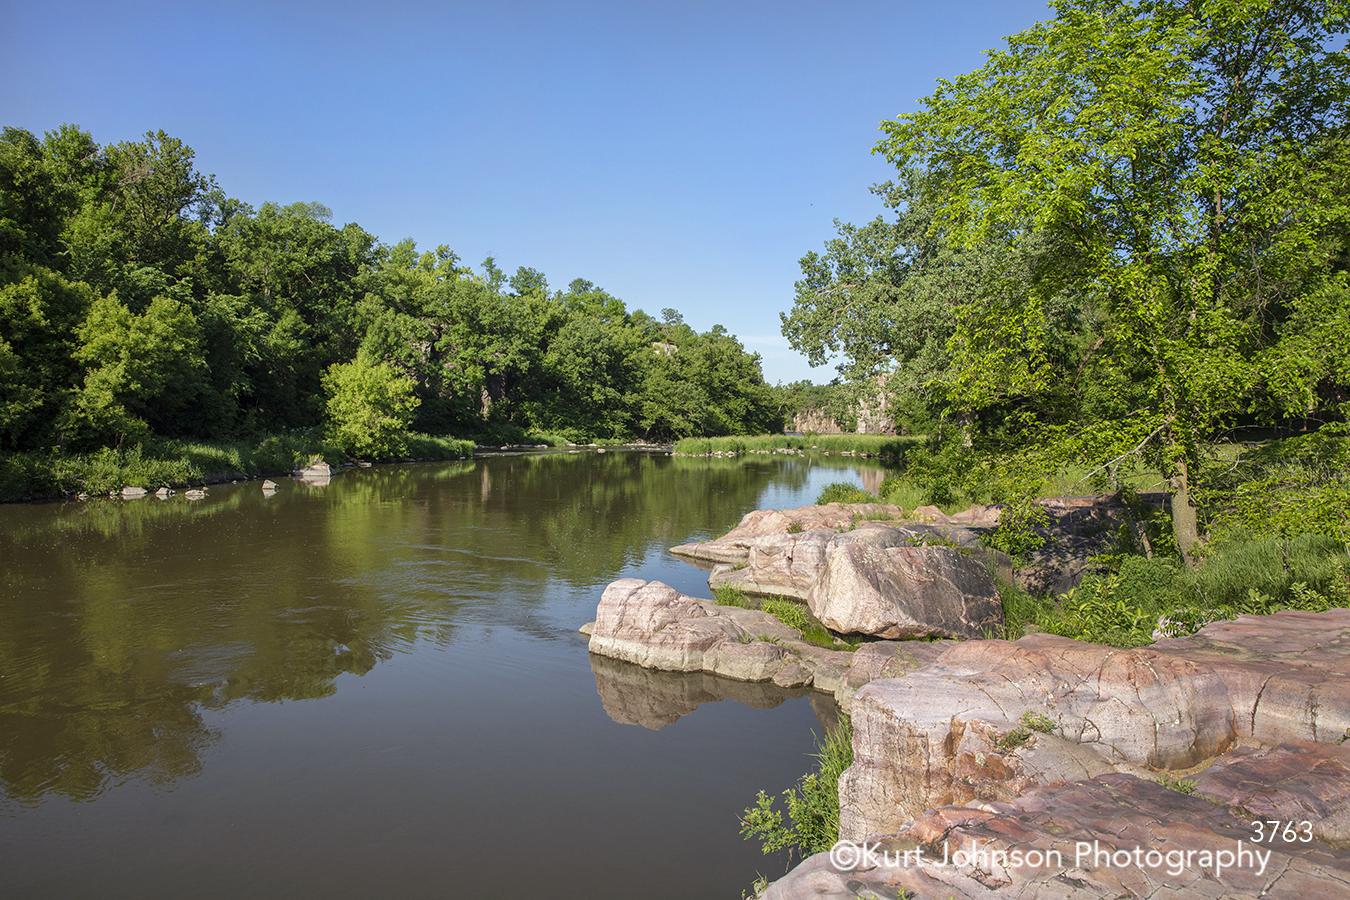 blue sky water reflection river stream rock stone shore edge green trees waterscape landscape